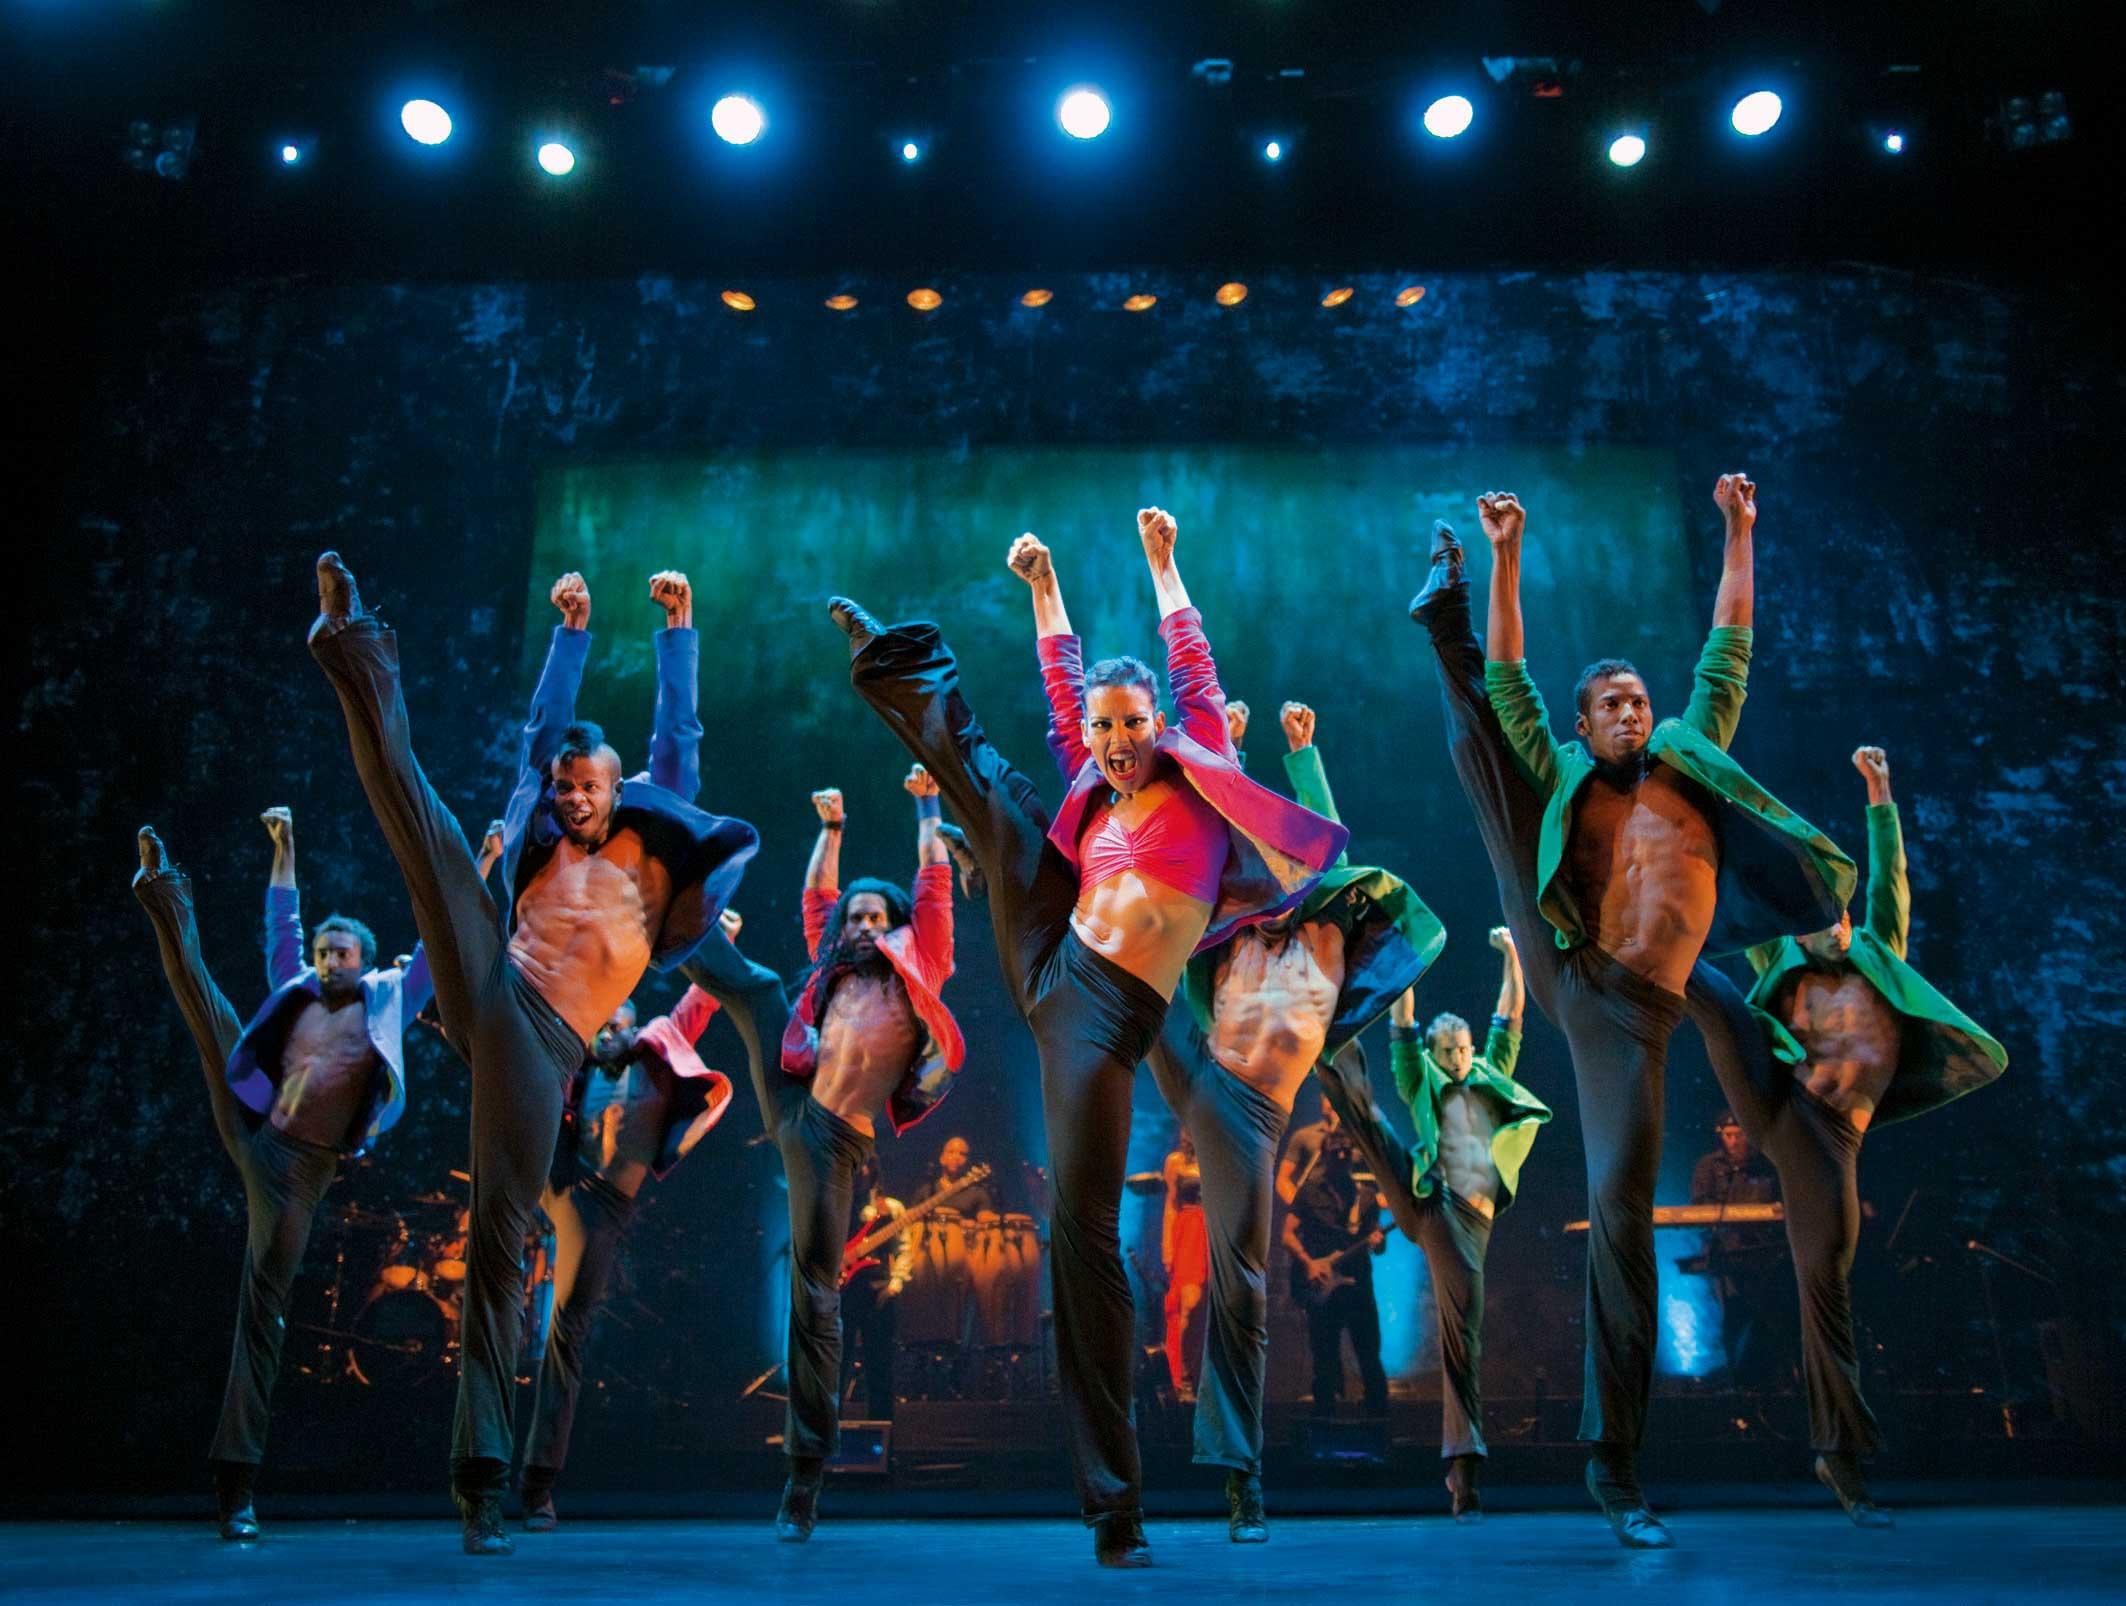 ballet-revolucion-special-03-credit-guido-ohlenbostel